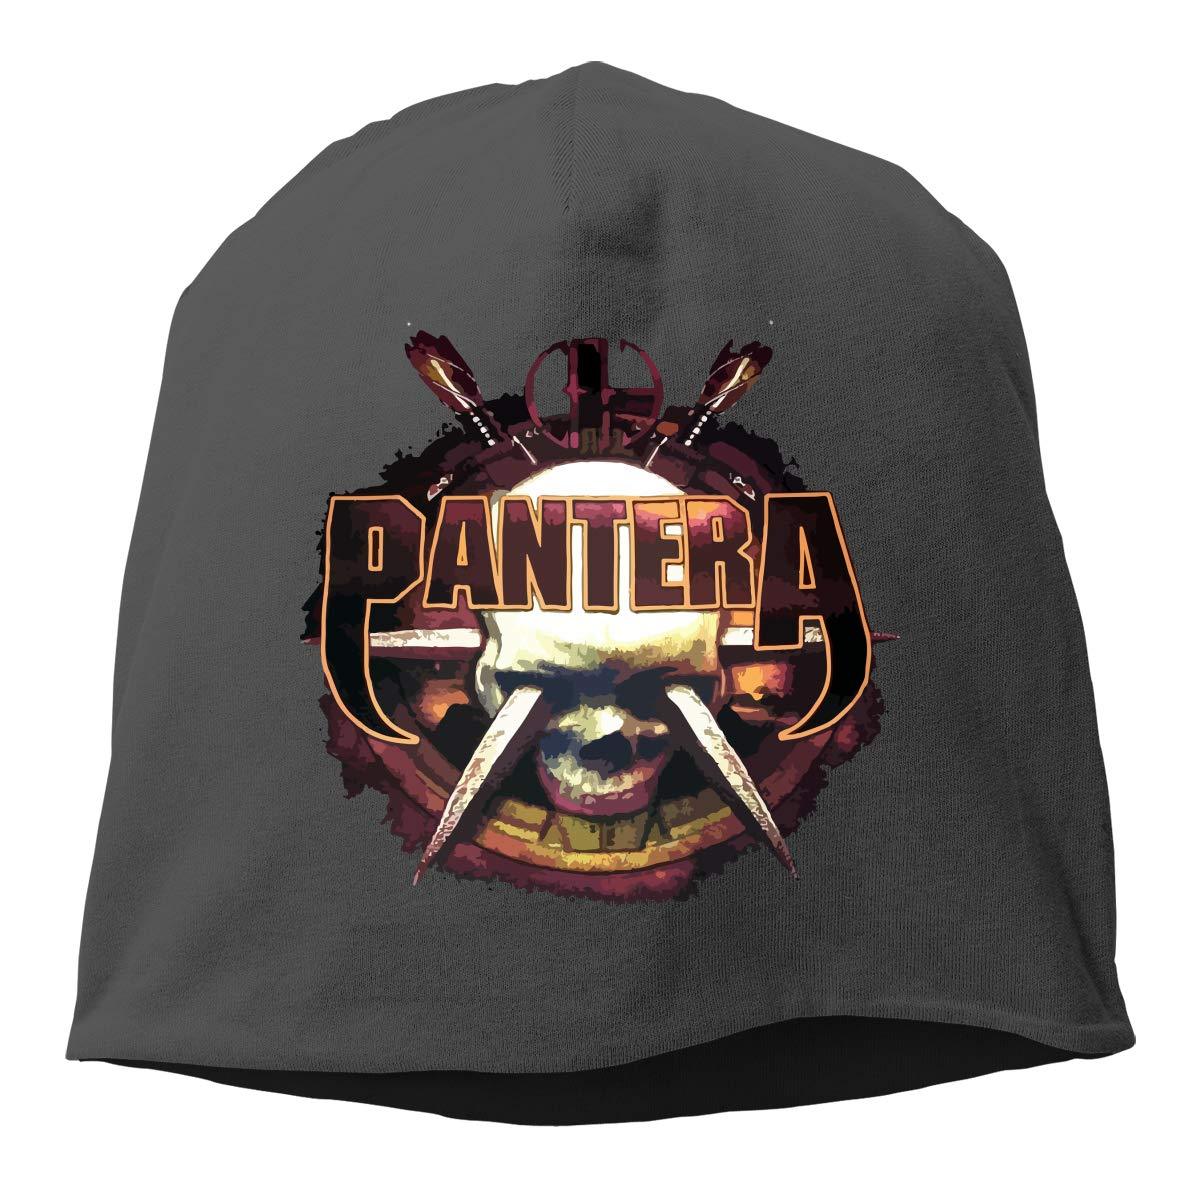 LixuA Beanie Skull Pantera Men Women Warm Comfortable Cotton Skull Knit Hat Cap